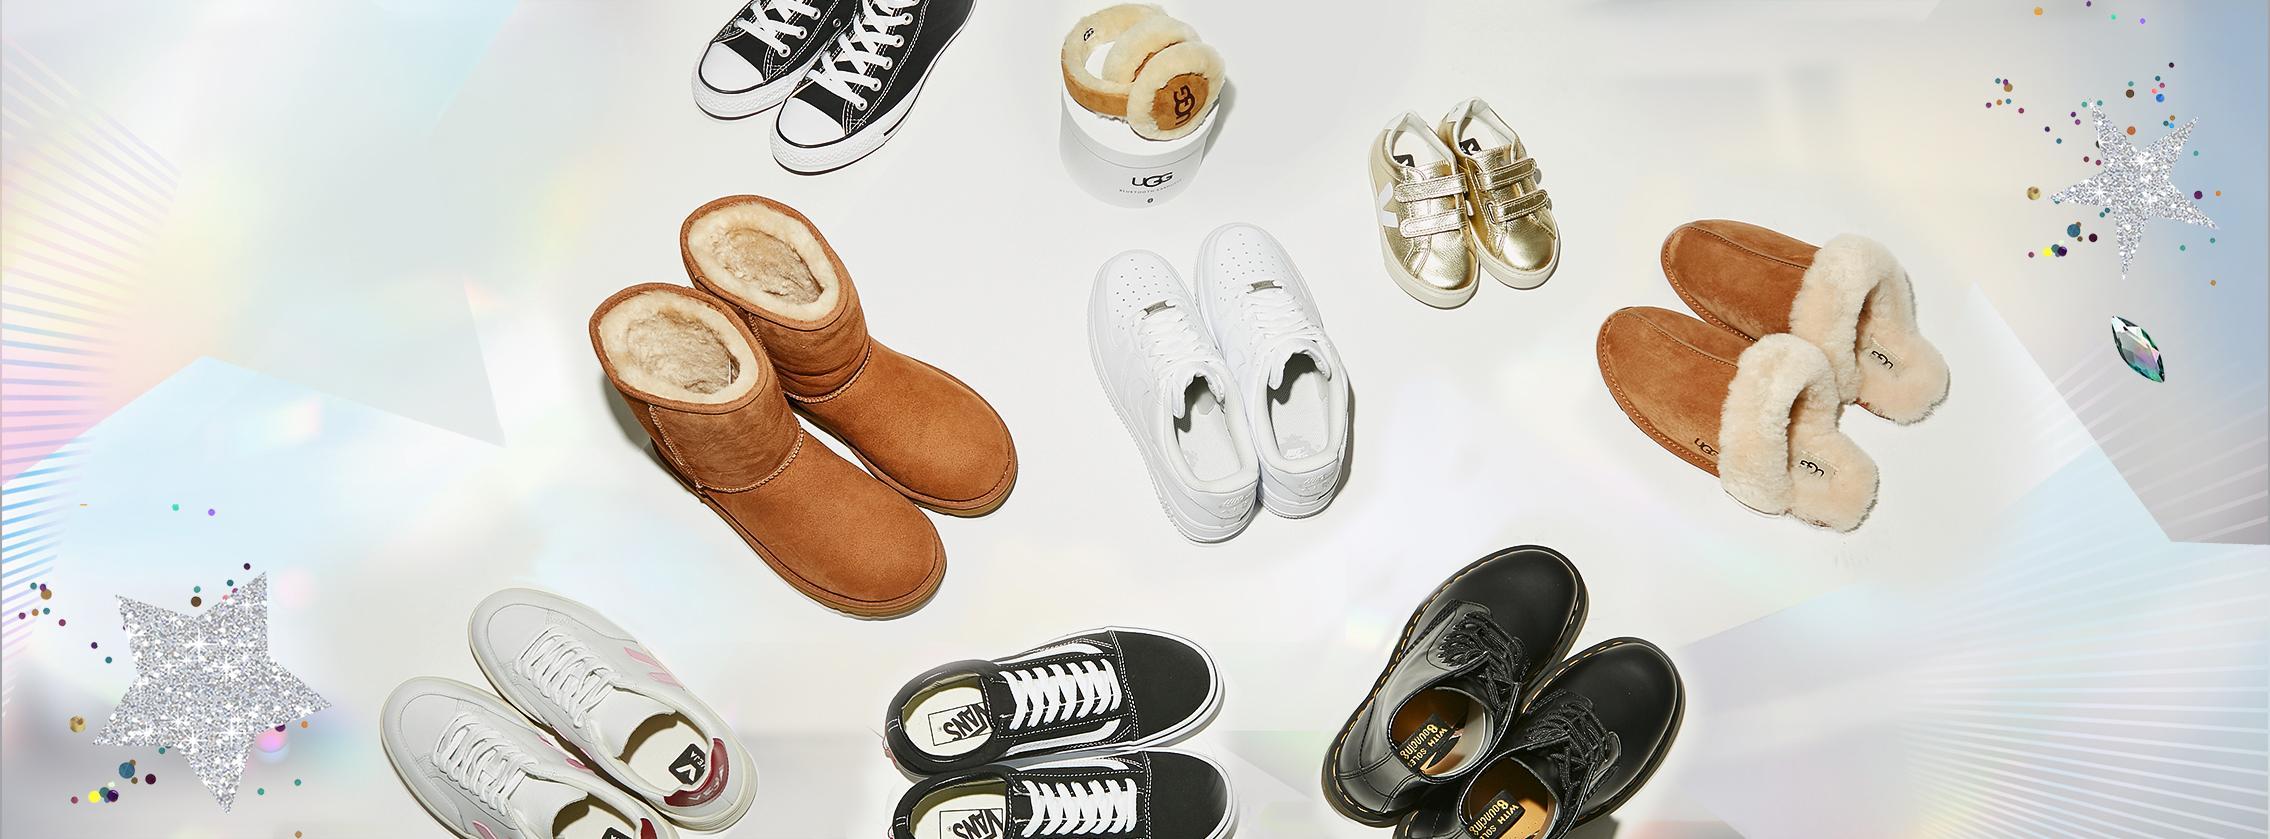 Shoes & Footwear | Shop Online High Street Fashion Shoes